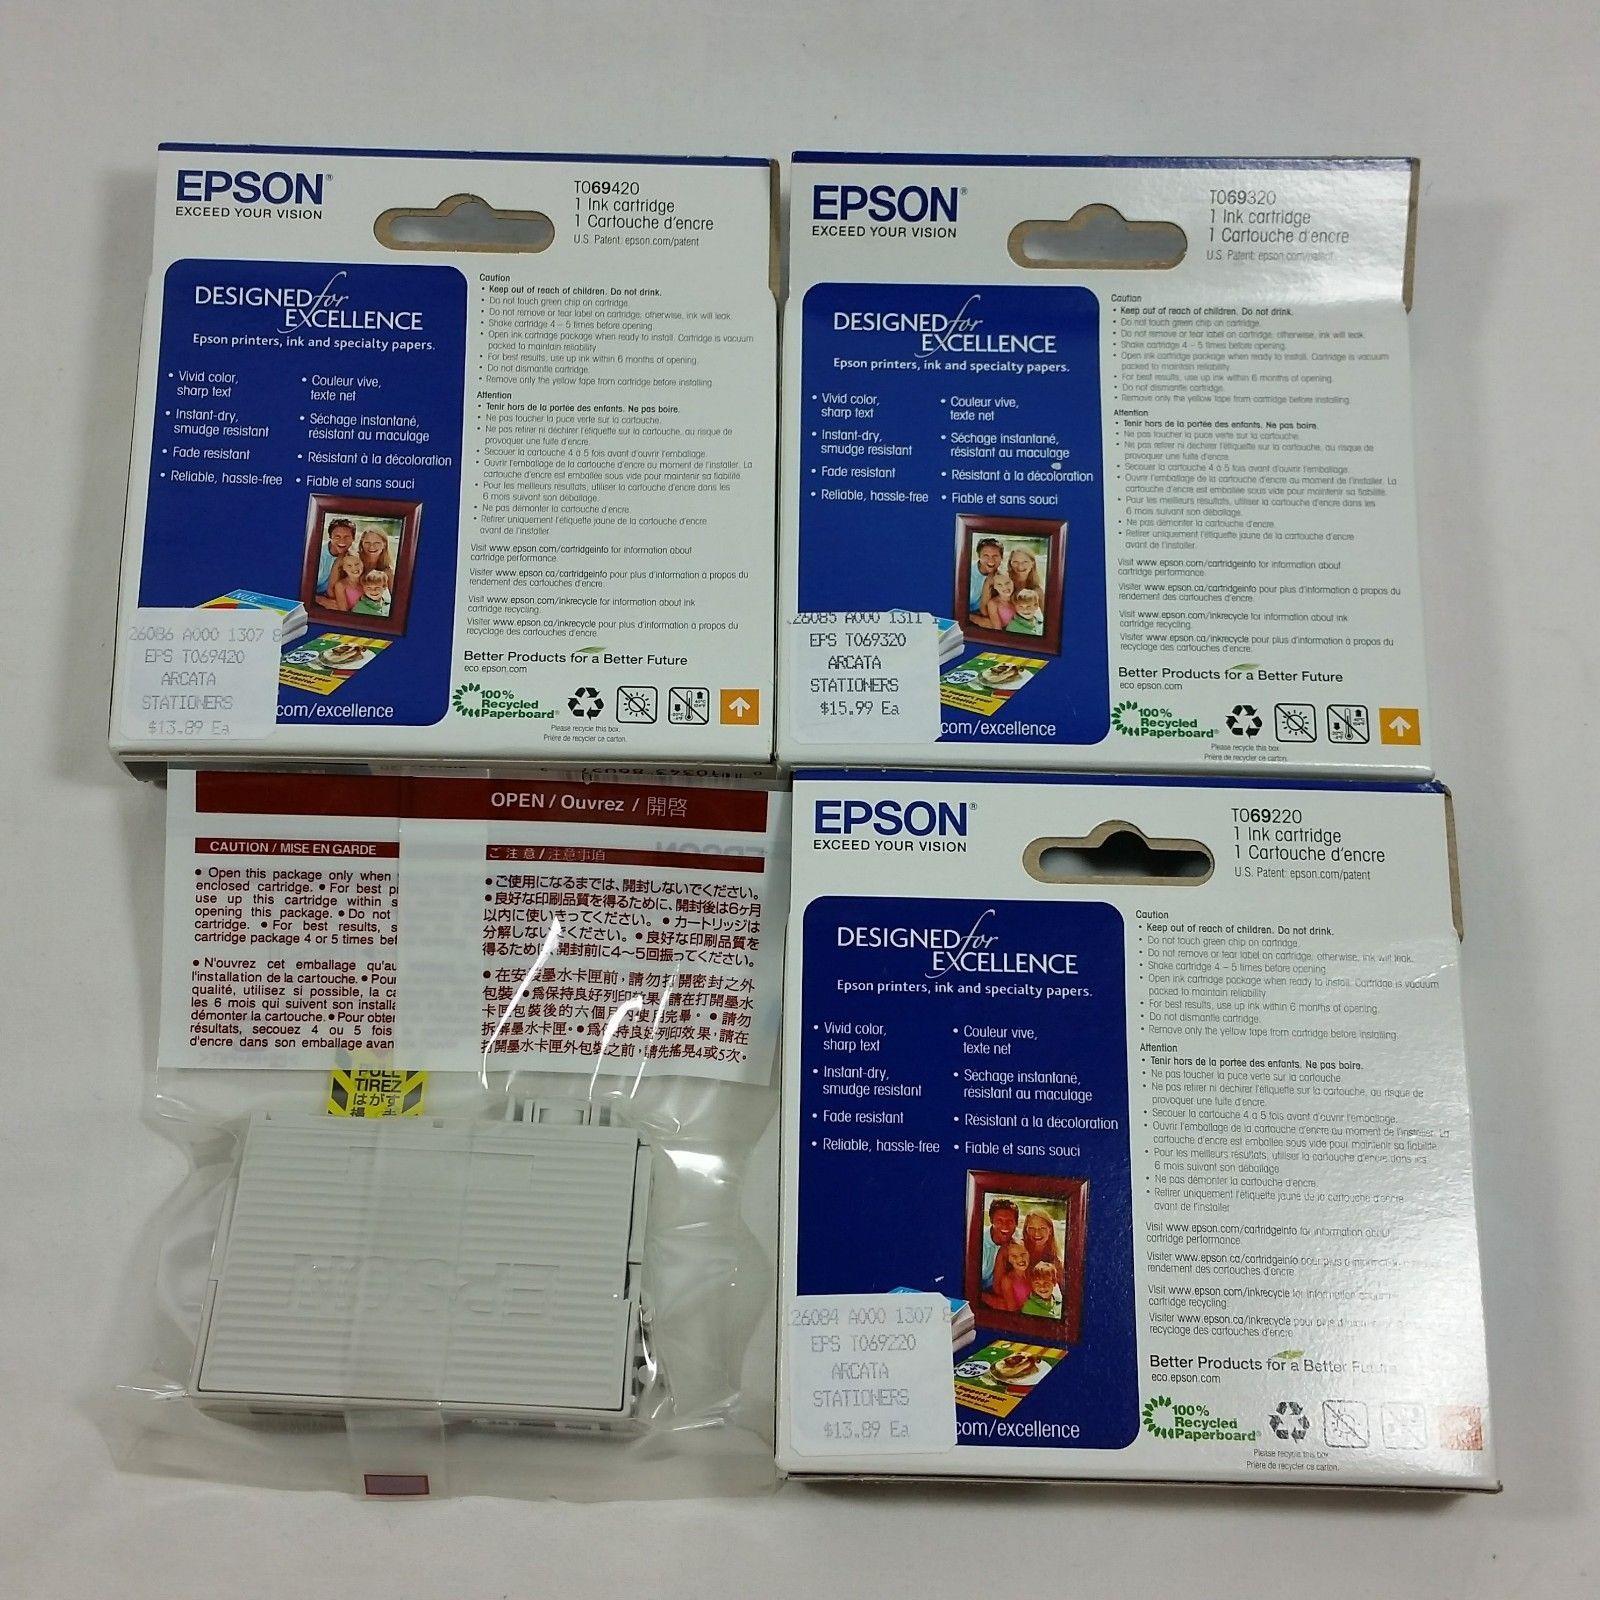 Epson 69 T069 Cyan Yellow Magenta Black Cartridges Lot of 4 Genuine OEM InkJet